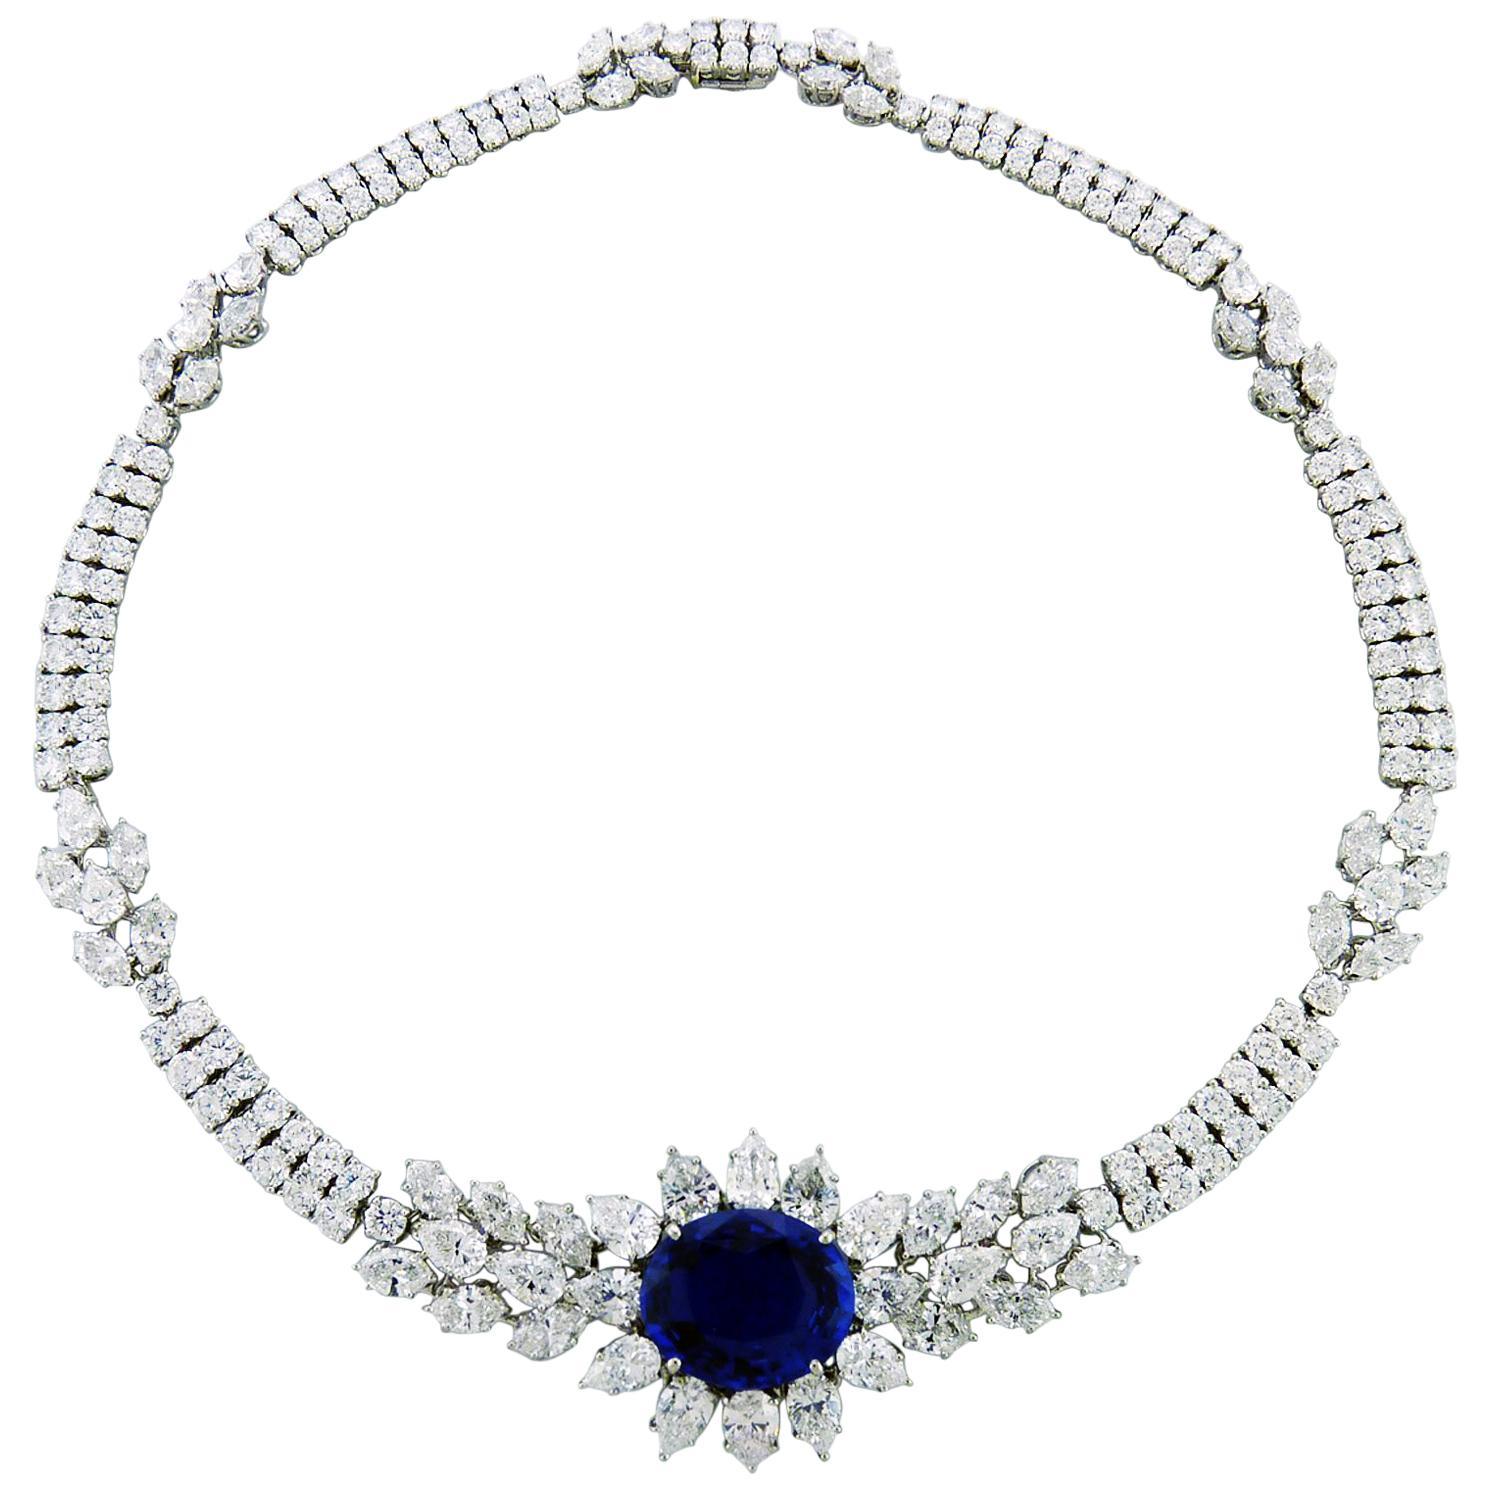 Certified Graff Sapphire Diamond Platinum Necklace